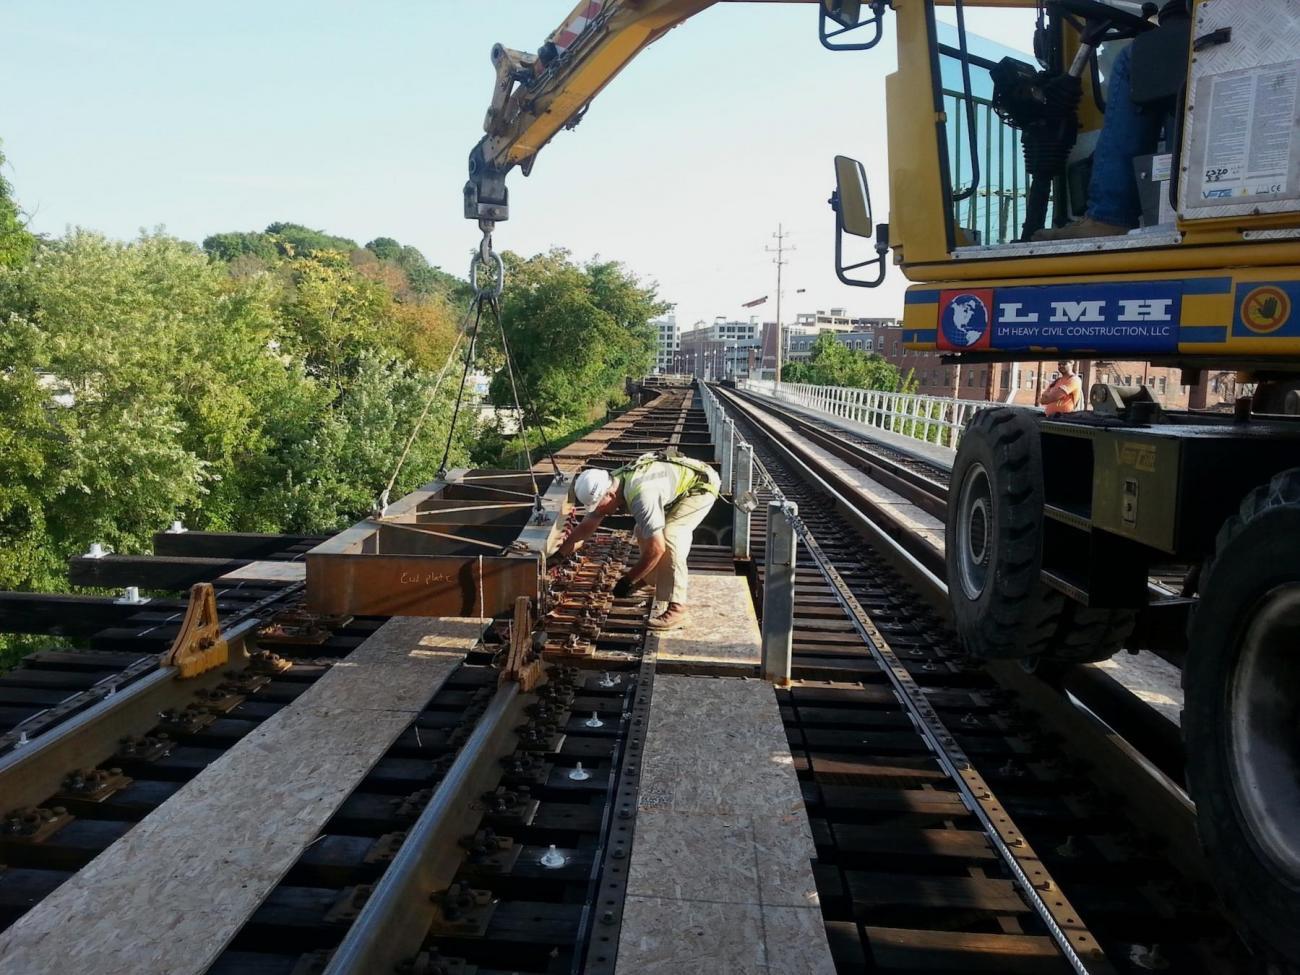 A crewman works on the rails on the Merrimack River Bridge